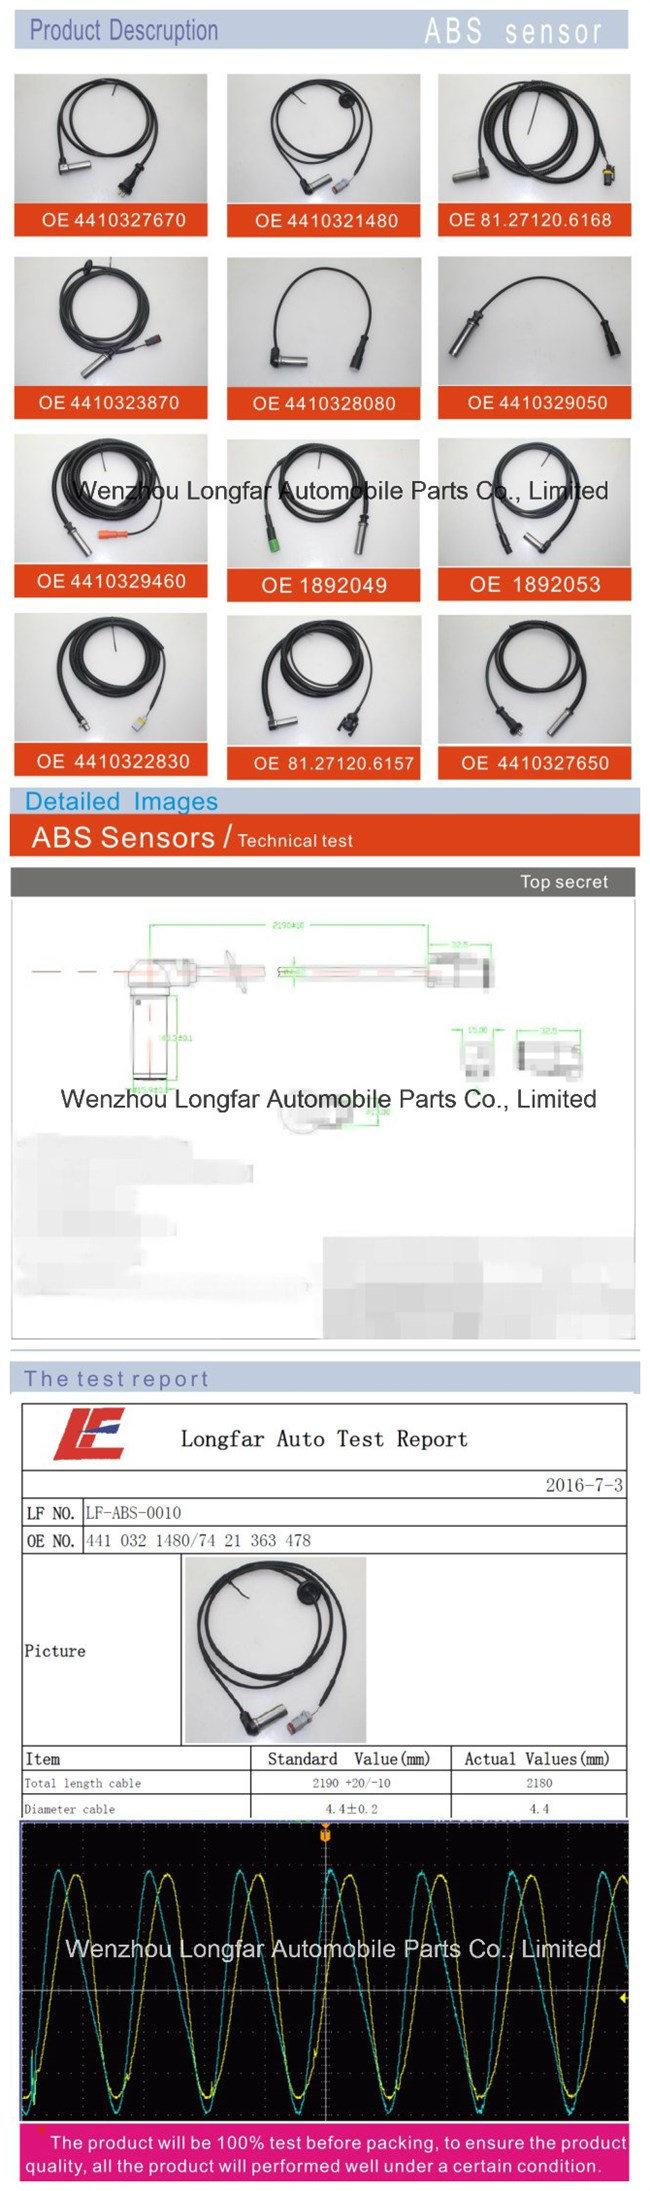 ABS Sensor Anti-Lock Braking System Sensor Transducer Indicator 4410323340 441 032 334 0 for Daf Iveco Renault Scania Mecedes-Benz Truck